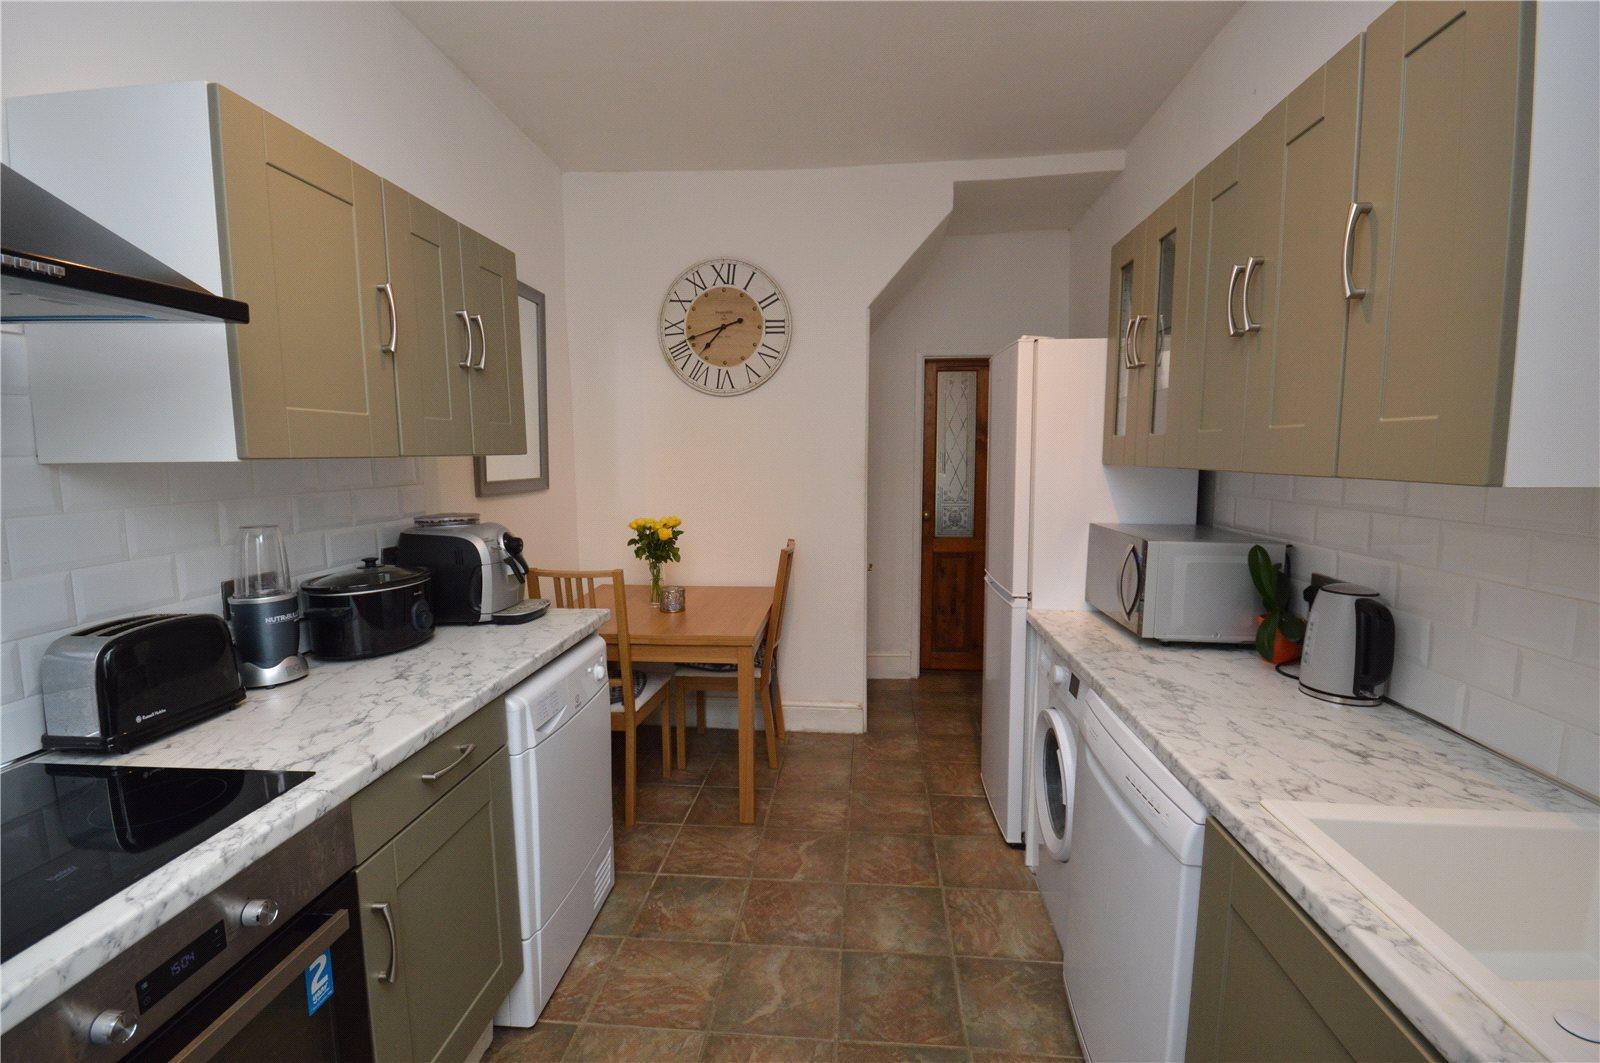 Property for sale in Calverley, interior kitchen